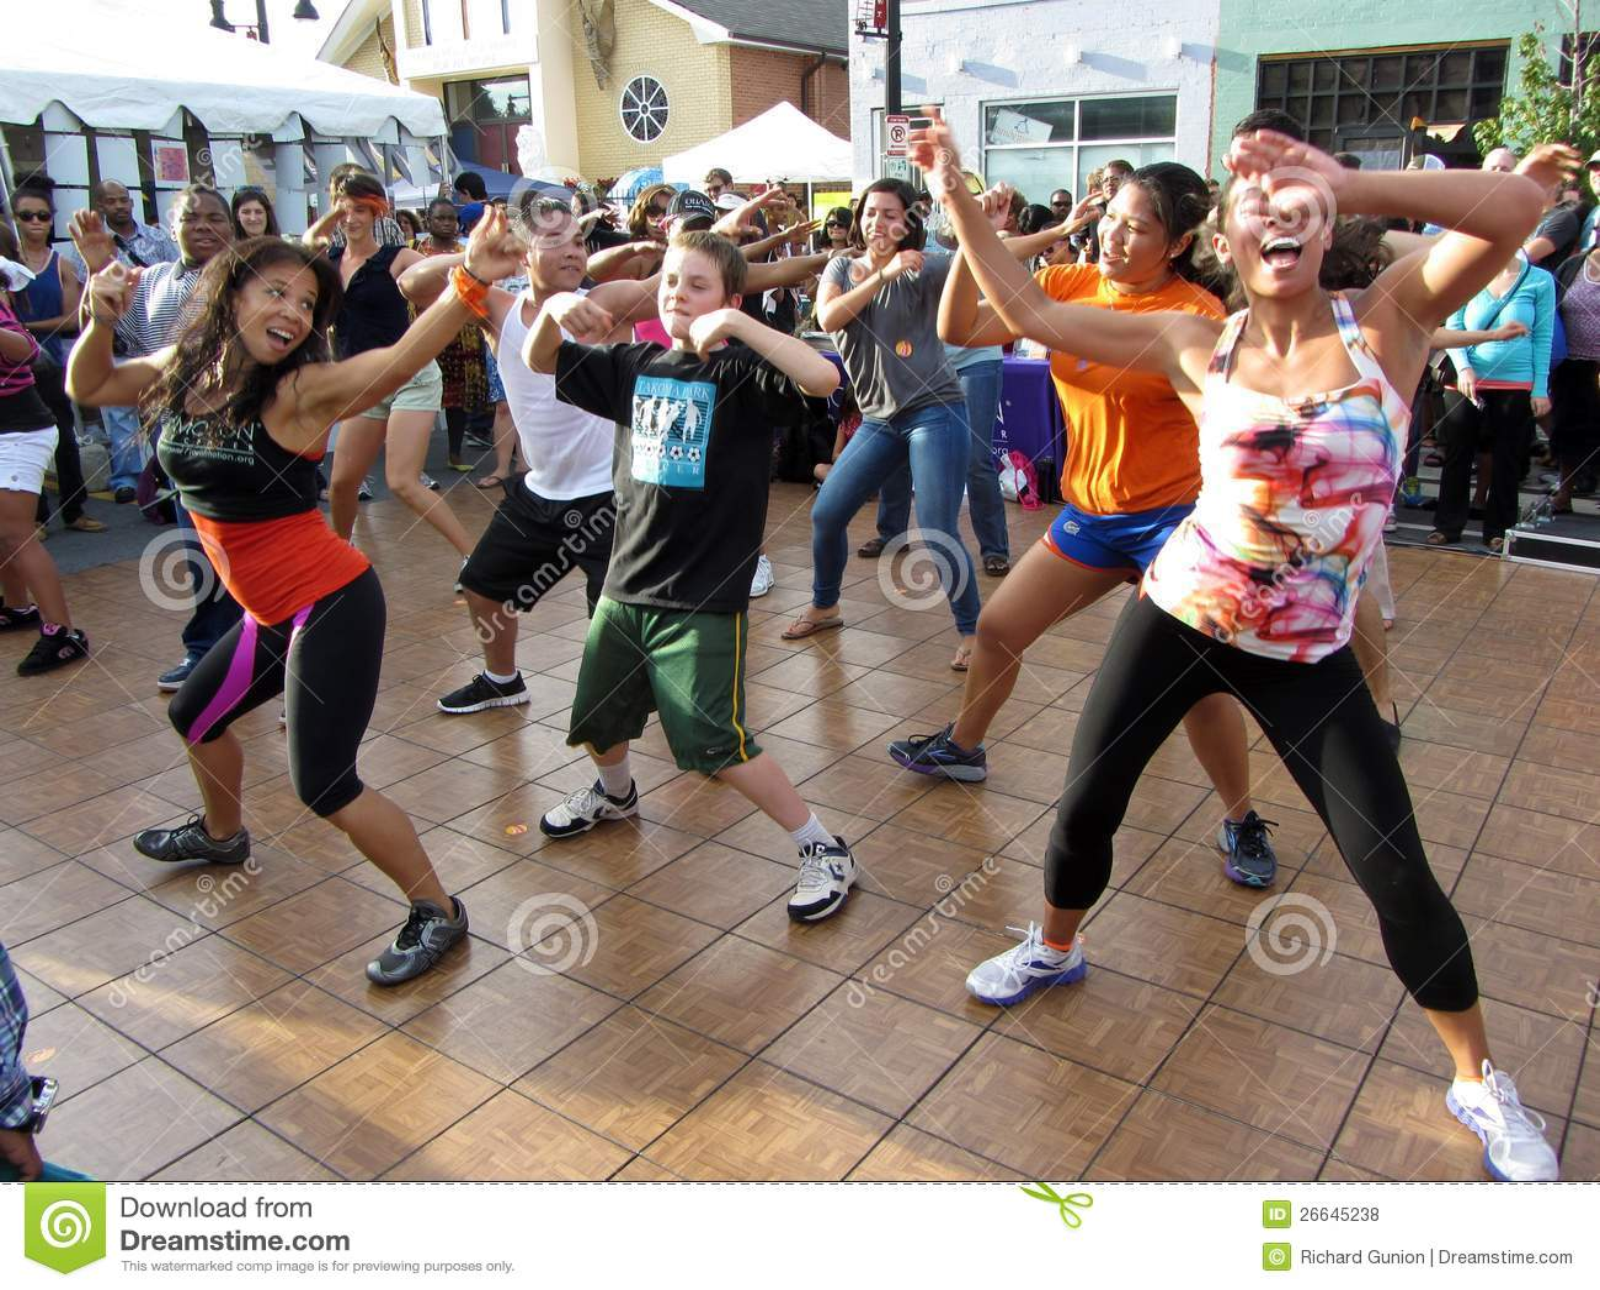 Rumba dance video free download